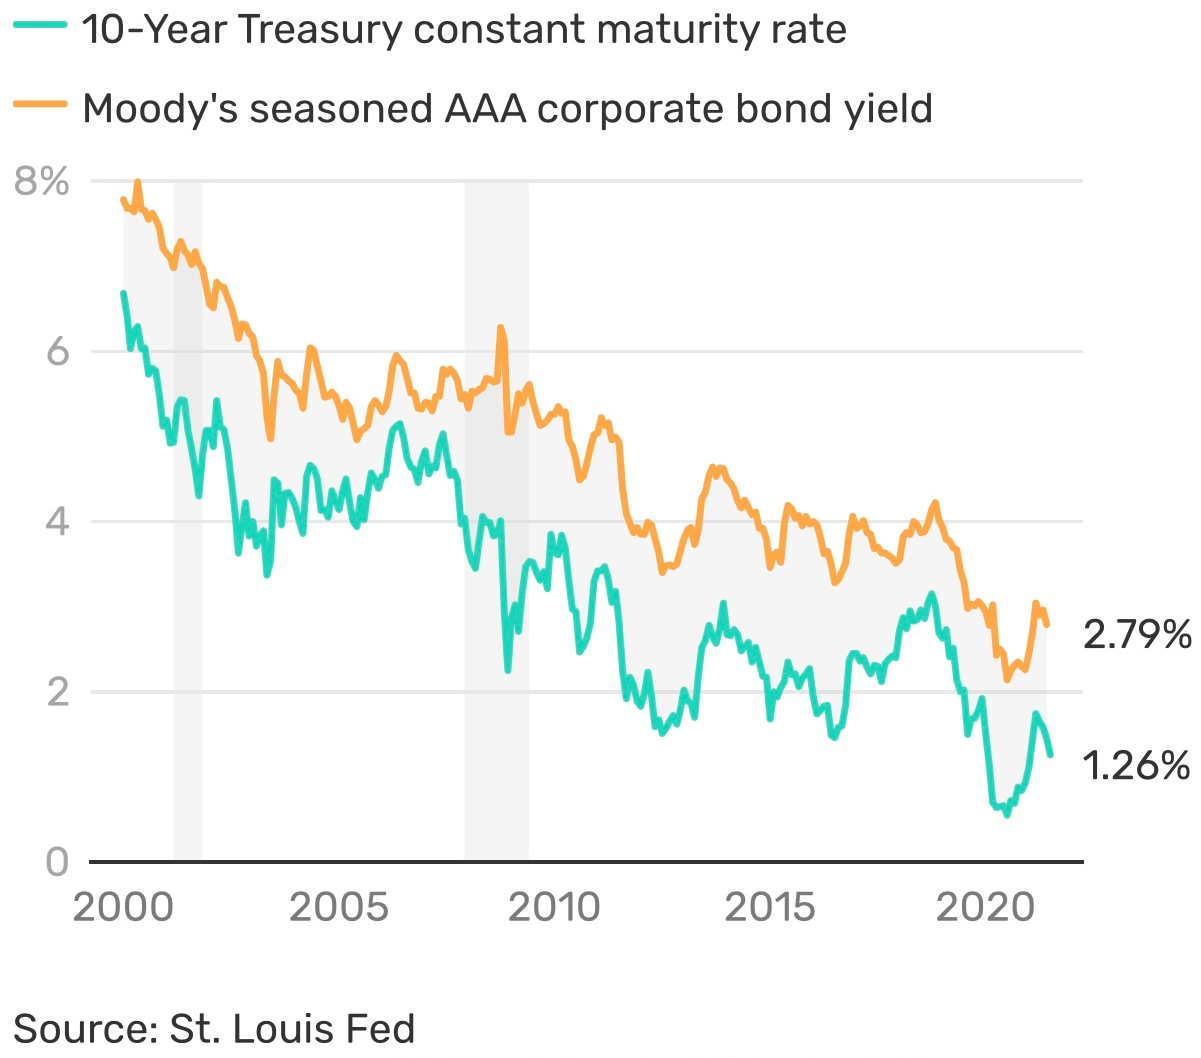 Corporate bond yield versus 10-year bond yield